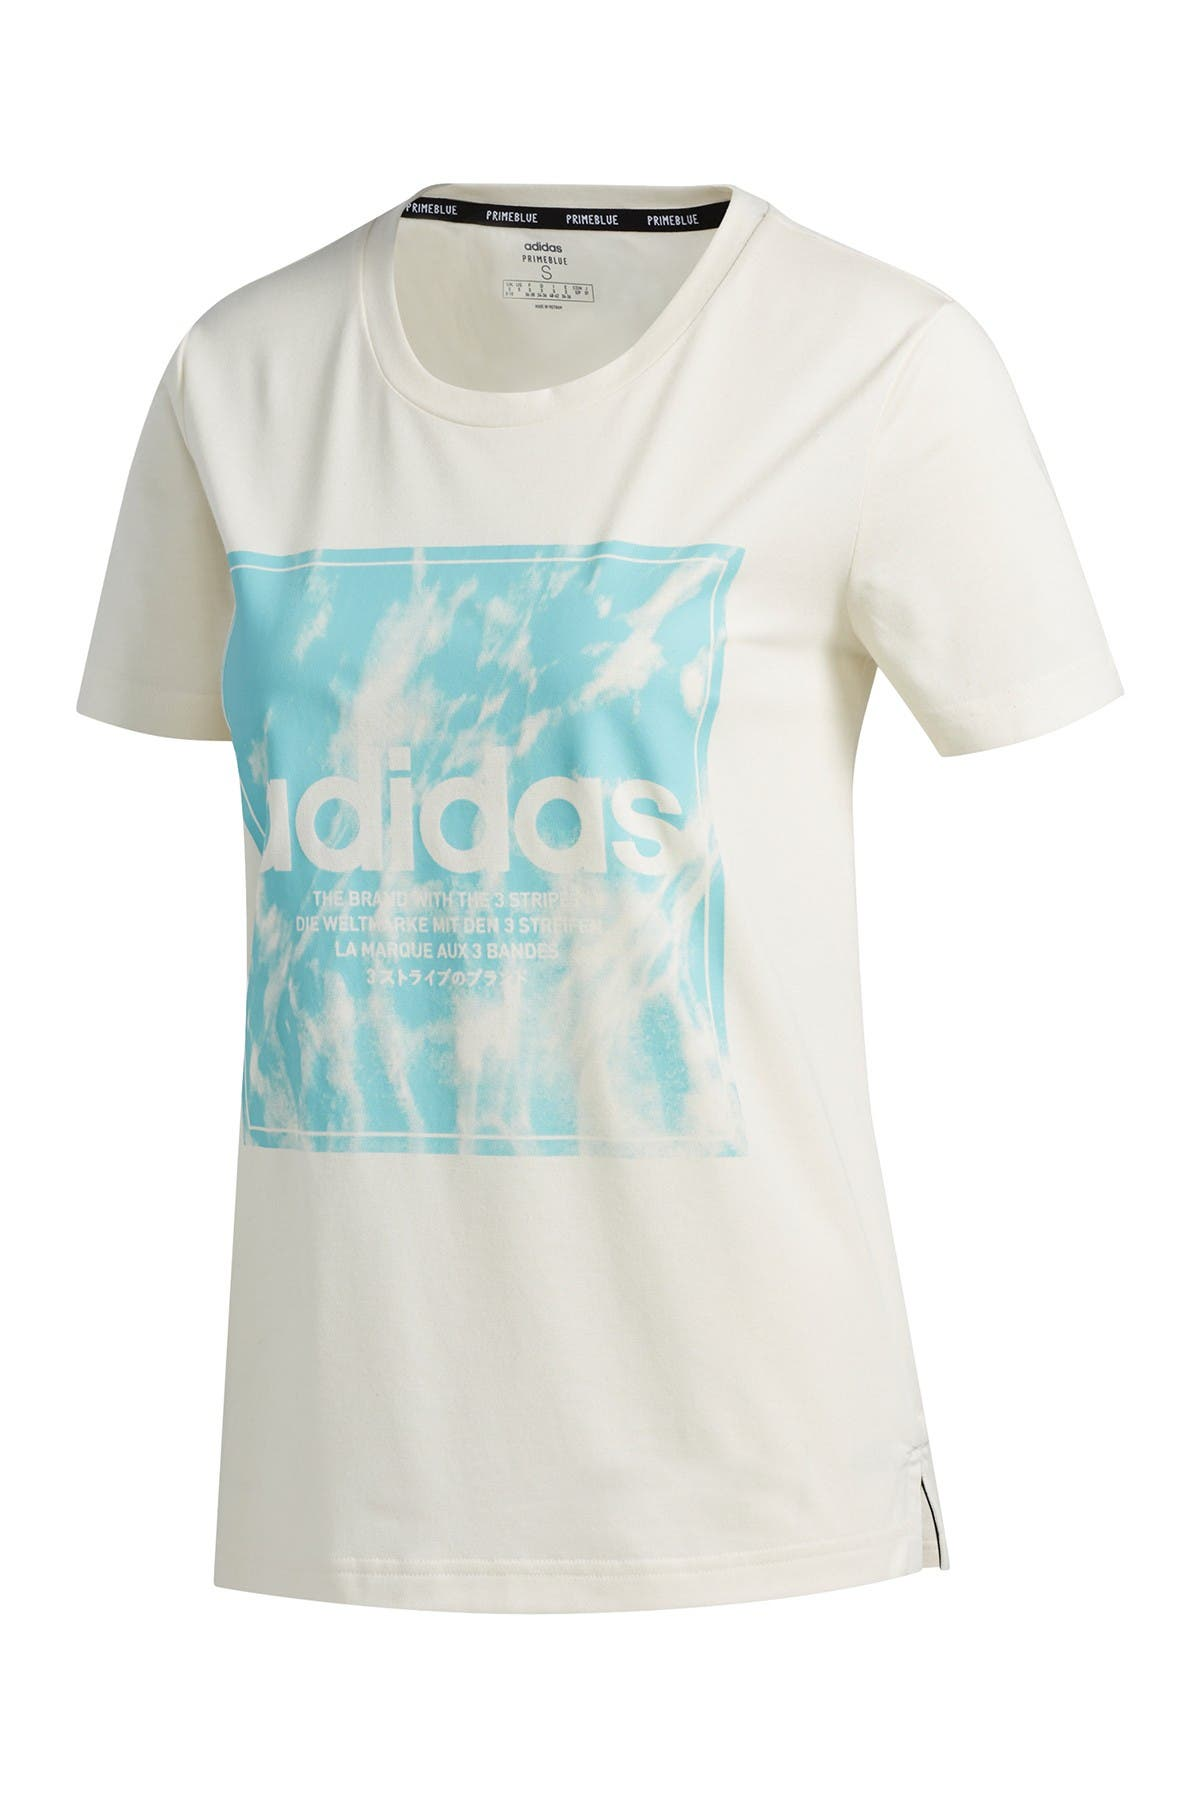 Image of adidas Primeblue Logo Graphic T-Shirt